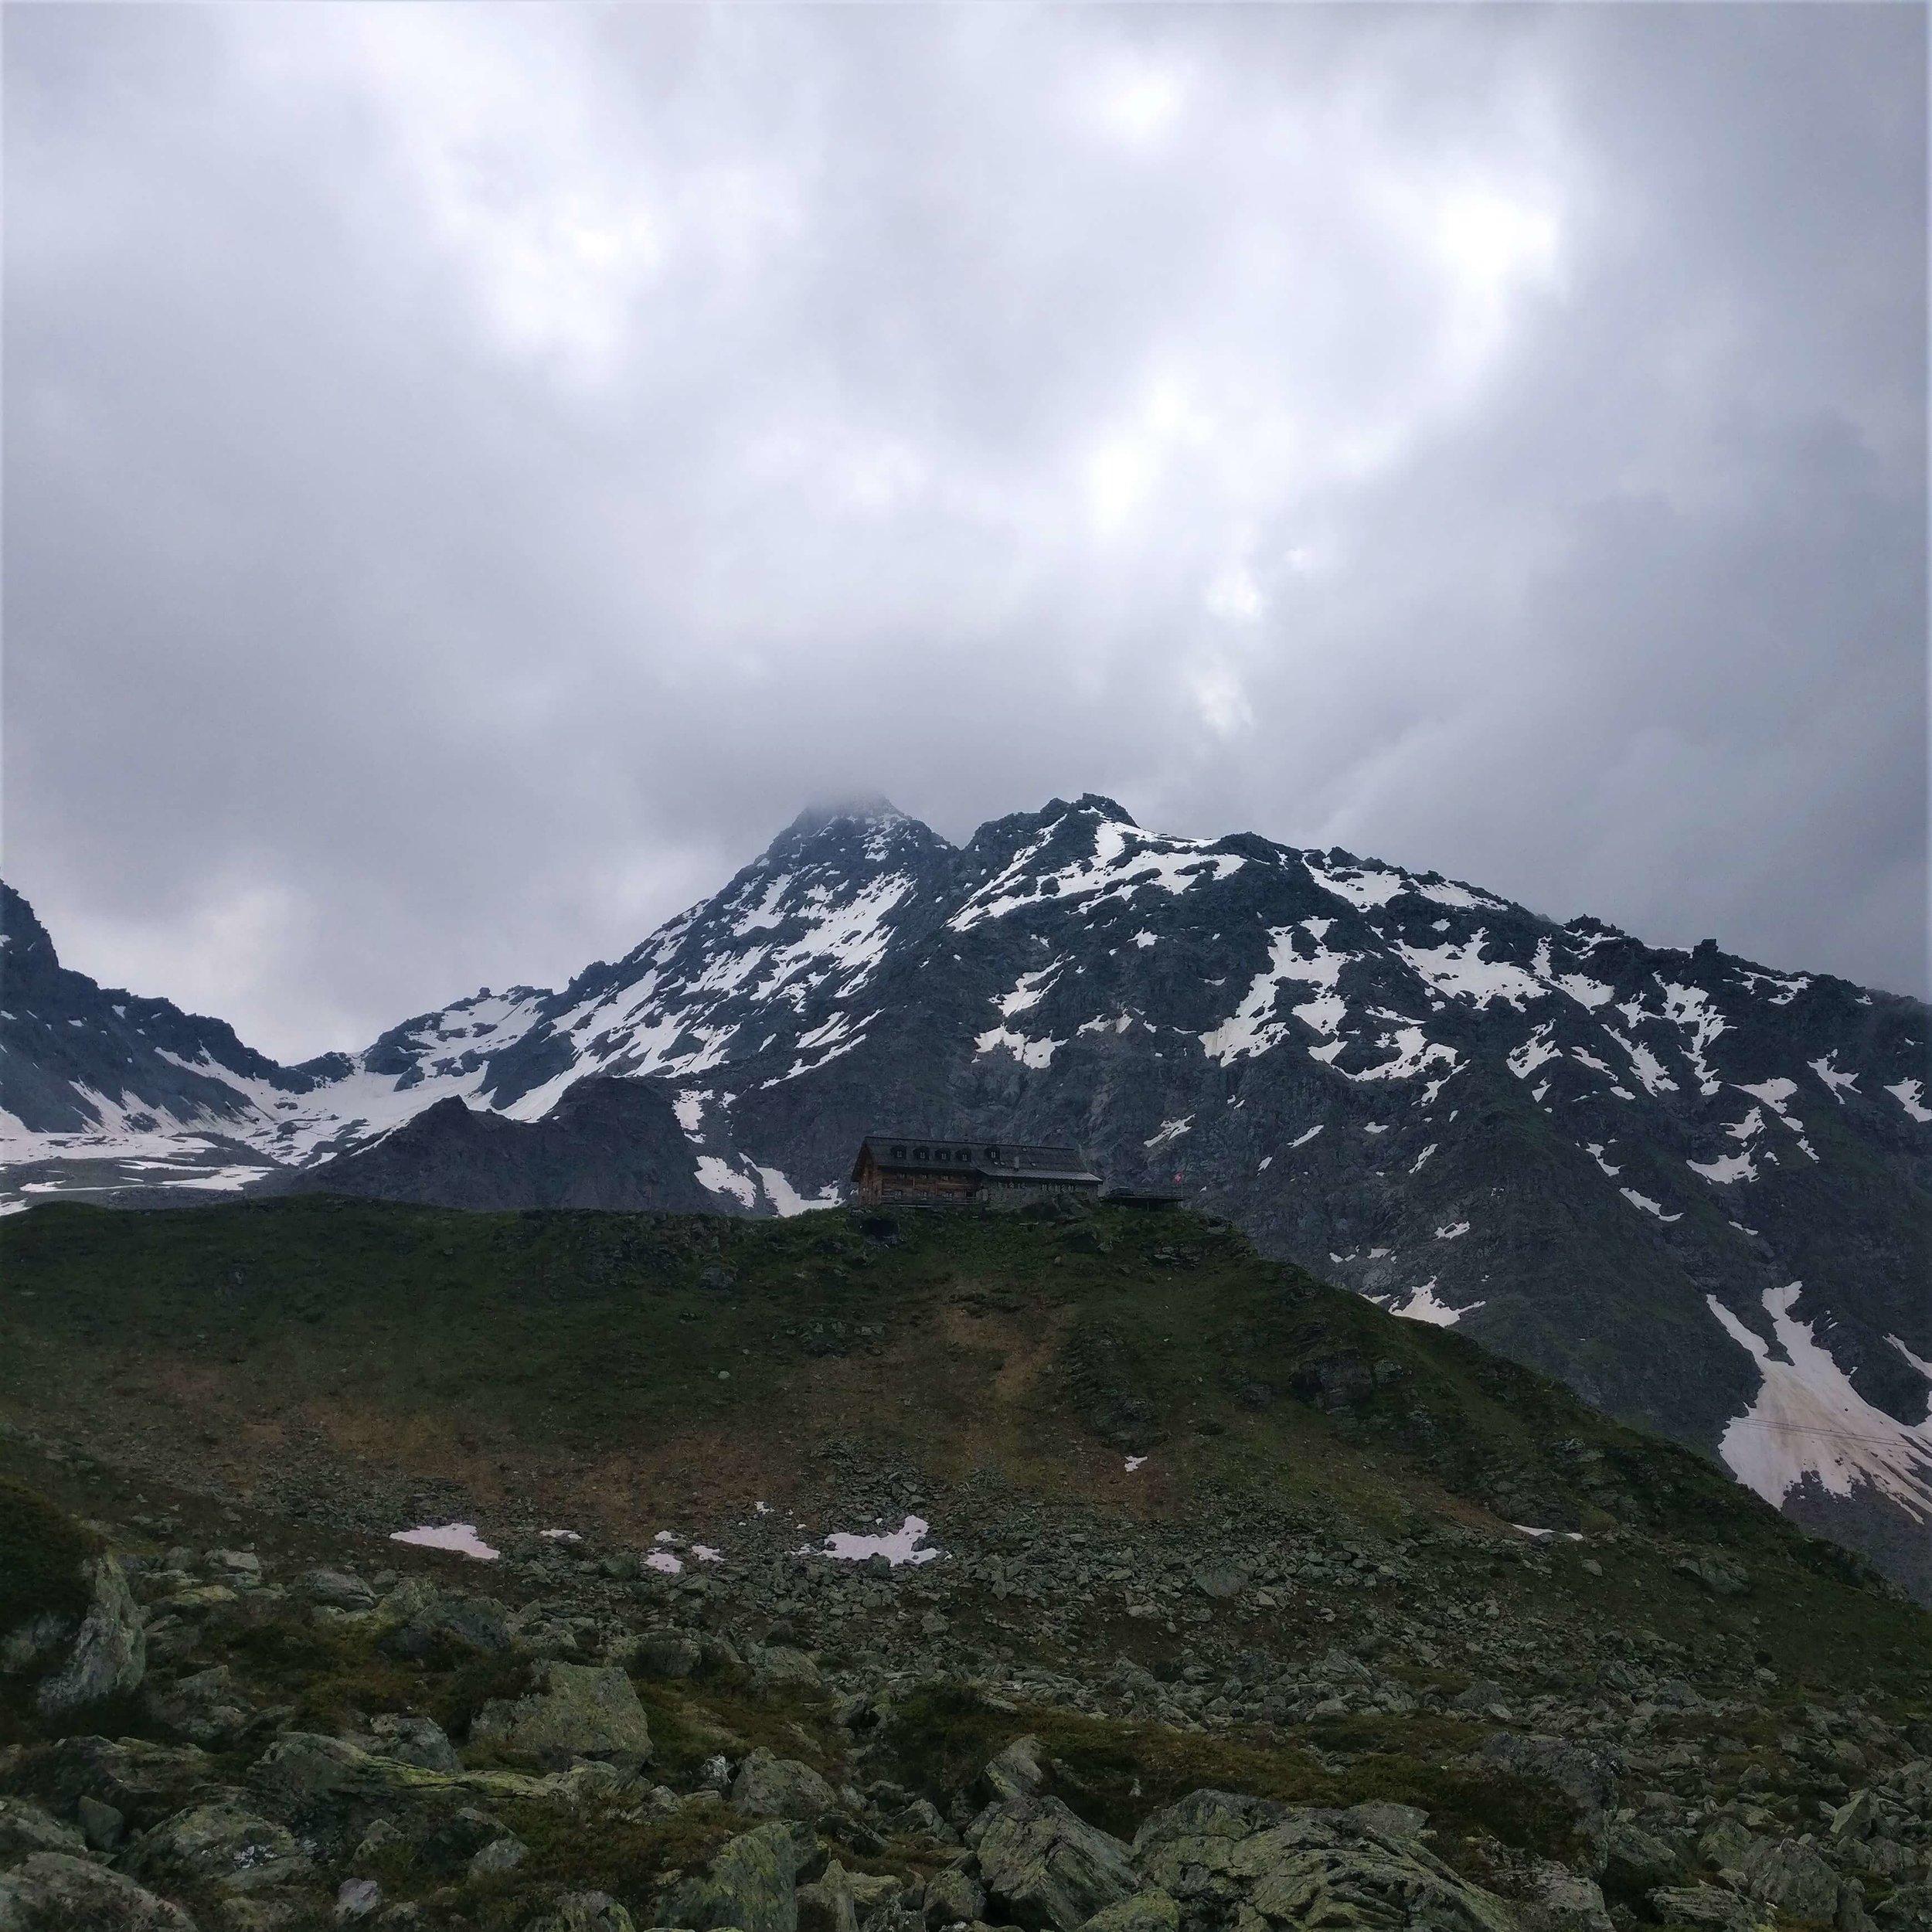 Cabane du Mont Fort:  Storm clouds brewing above the alpine hut